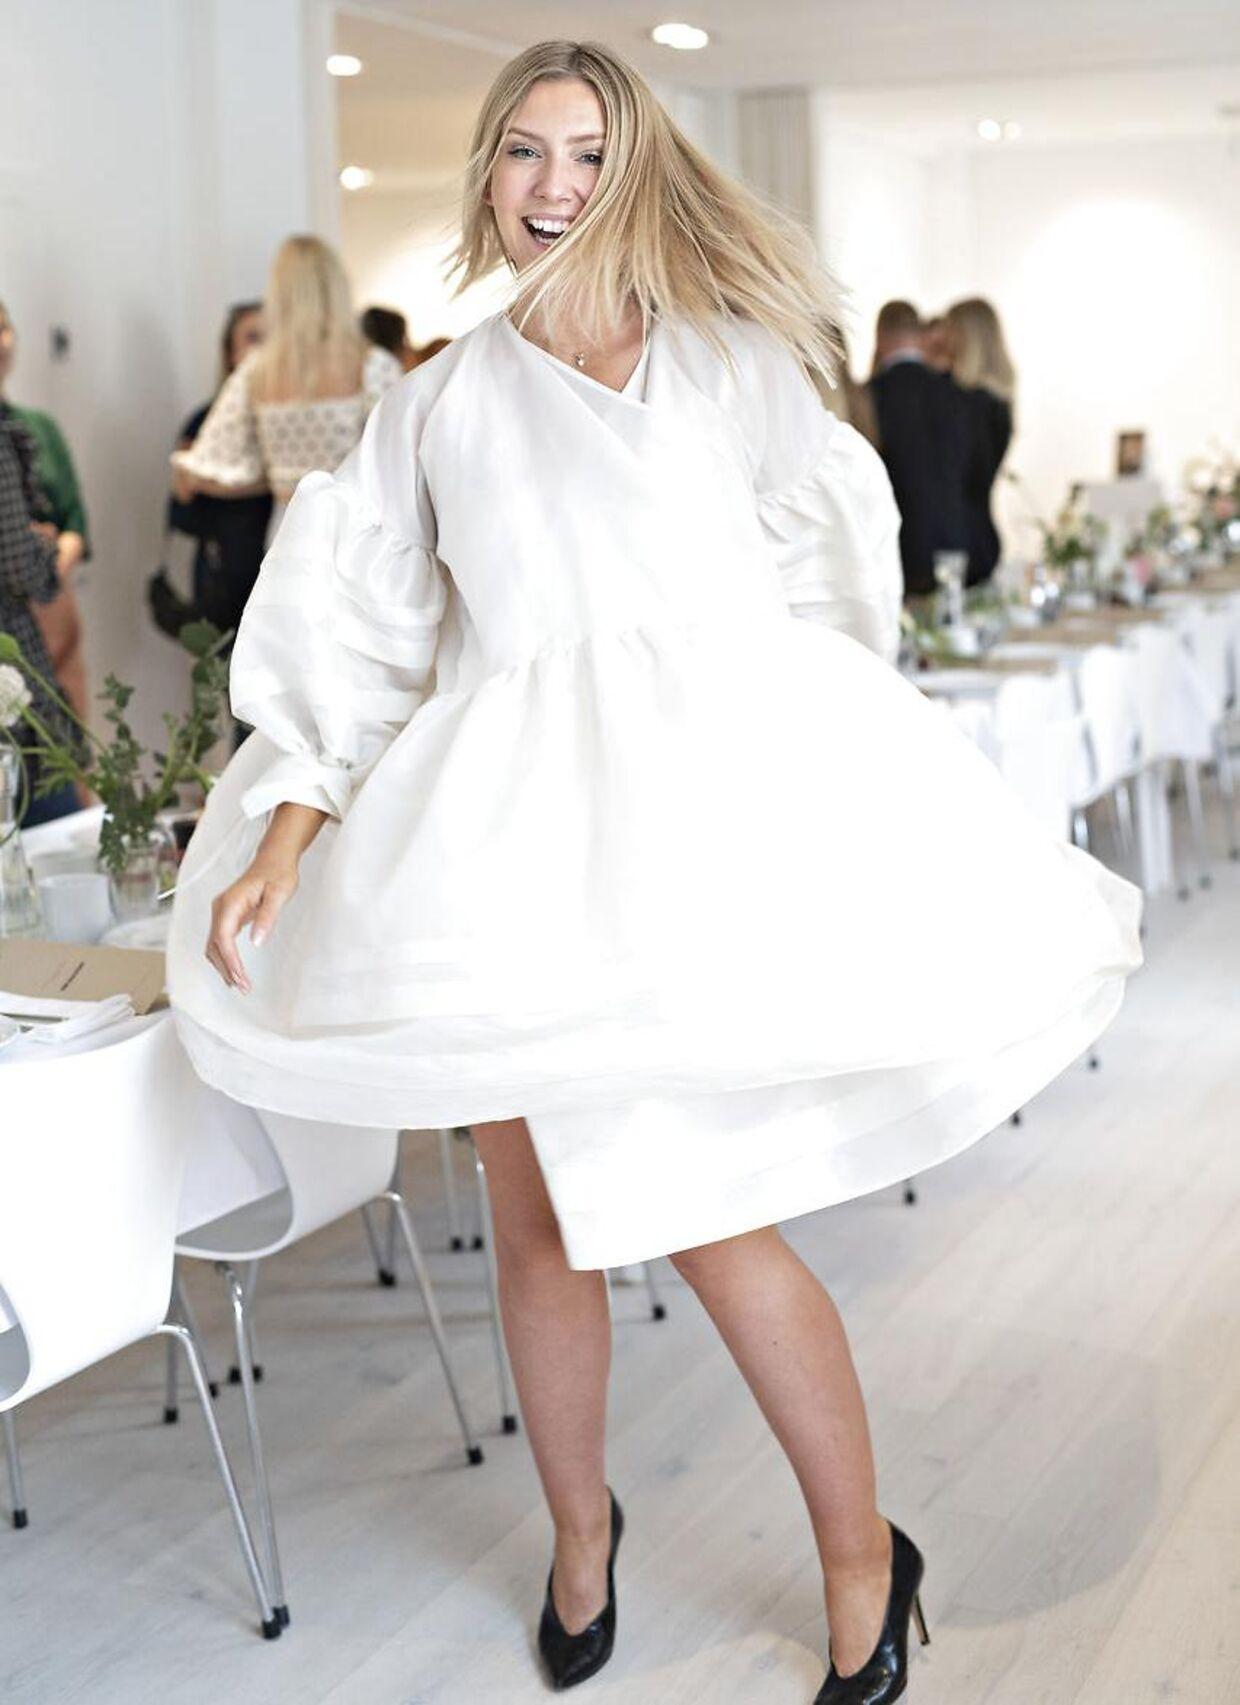 Carla Mickelborg danser glad og lykkeligt rundt til sin reception